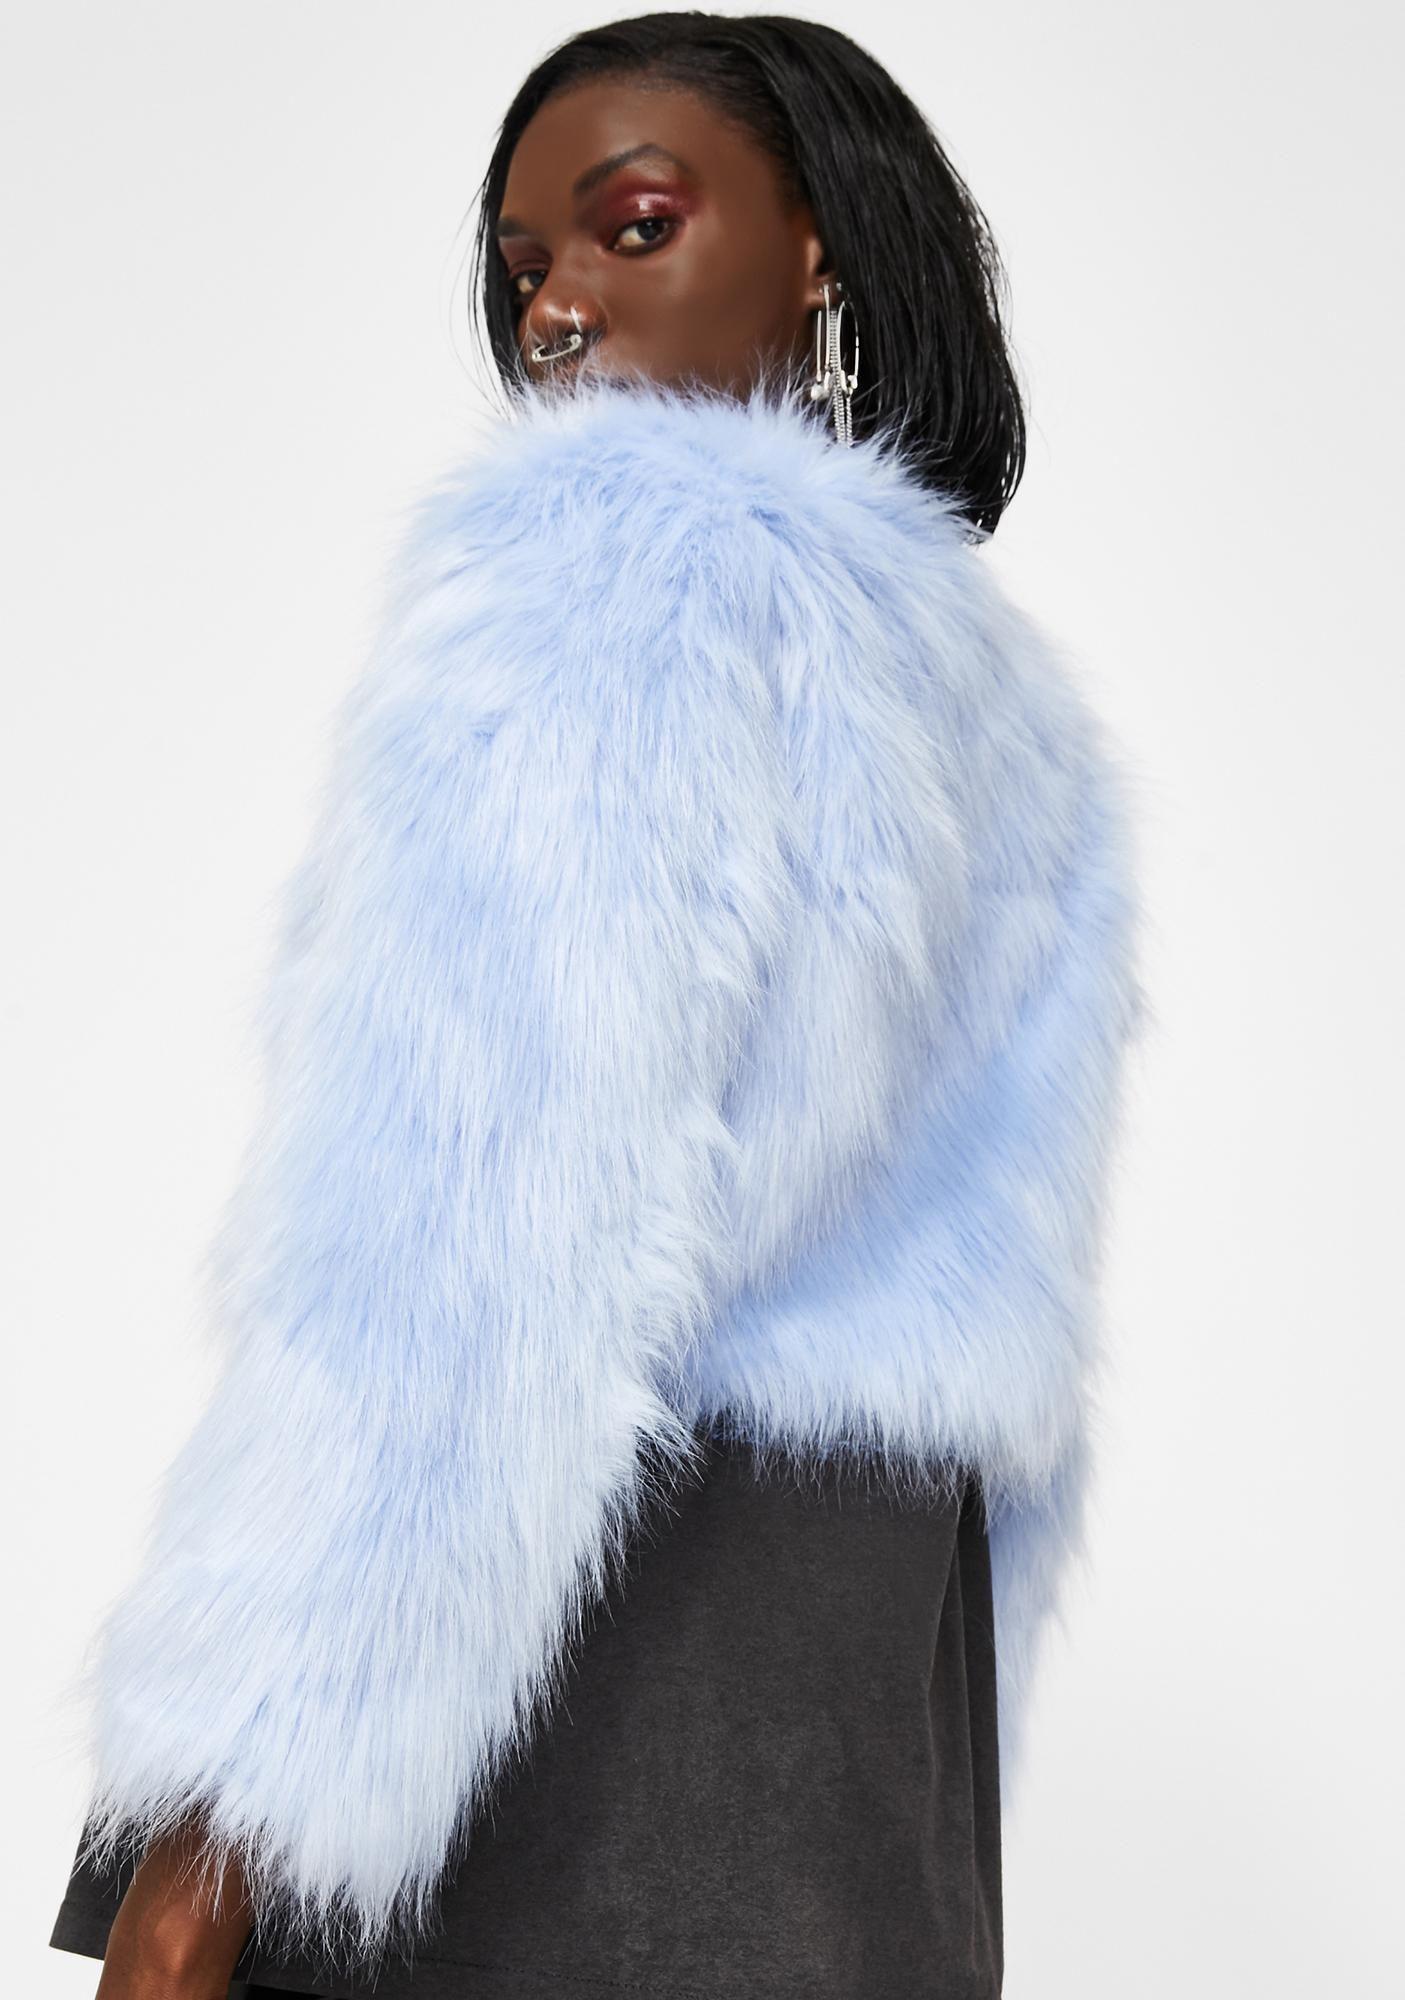 Azalea Wang Light Blue Michigan Ave Fuzzy Jacket Dolls Kill Fuzzy Jacket Jackets Faux Fur Hoodie